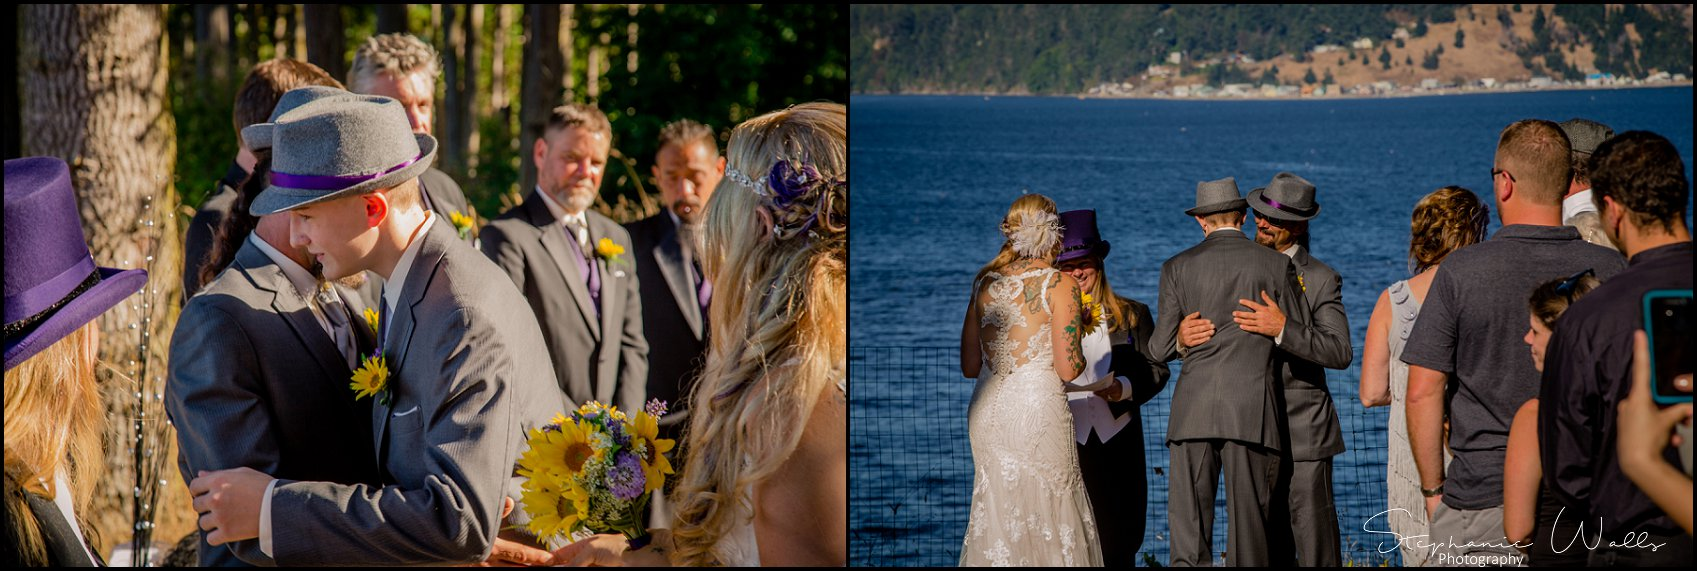 Everist Wedding 154 Patti & Bobbys | Troll Haven Castle & Bandy Farms | Sequim, Wa Wedding Photographer